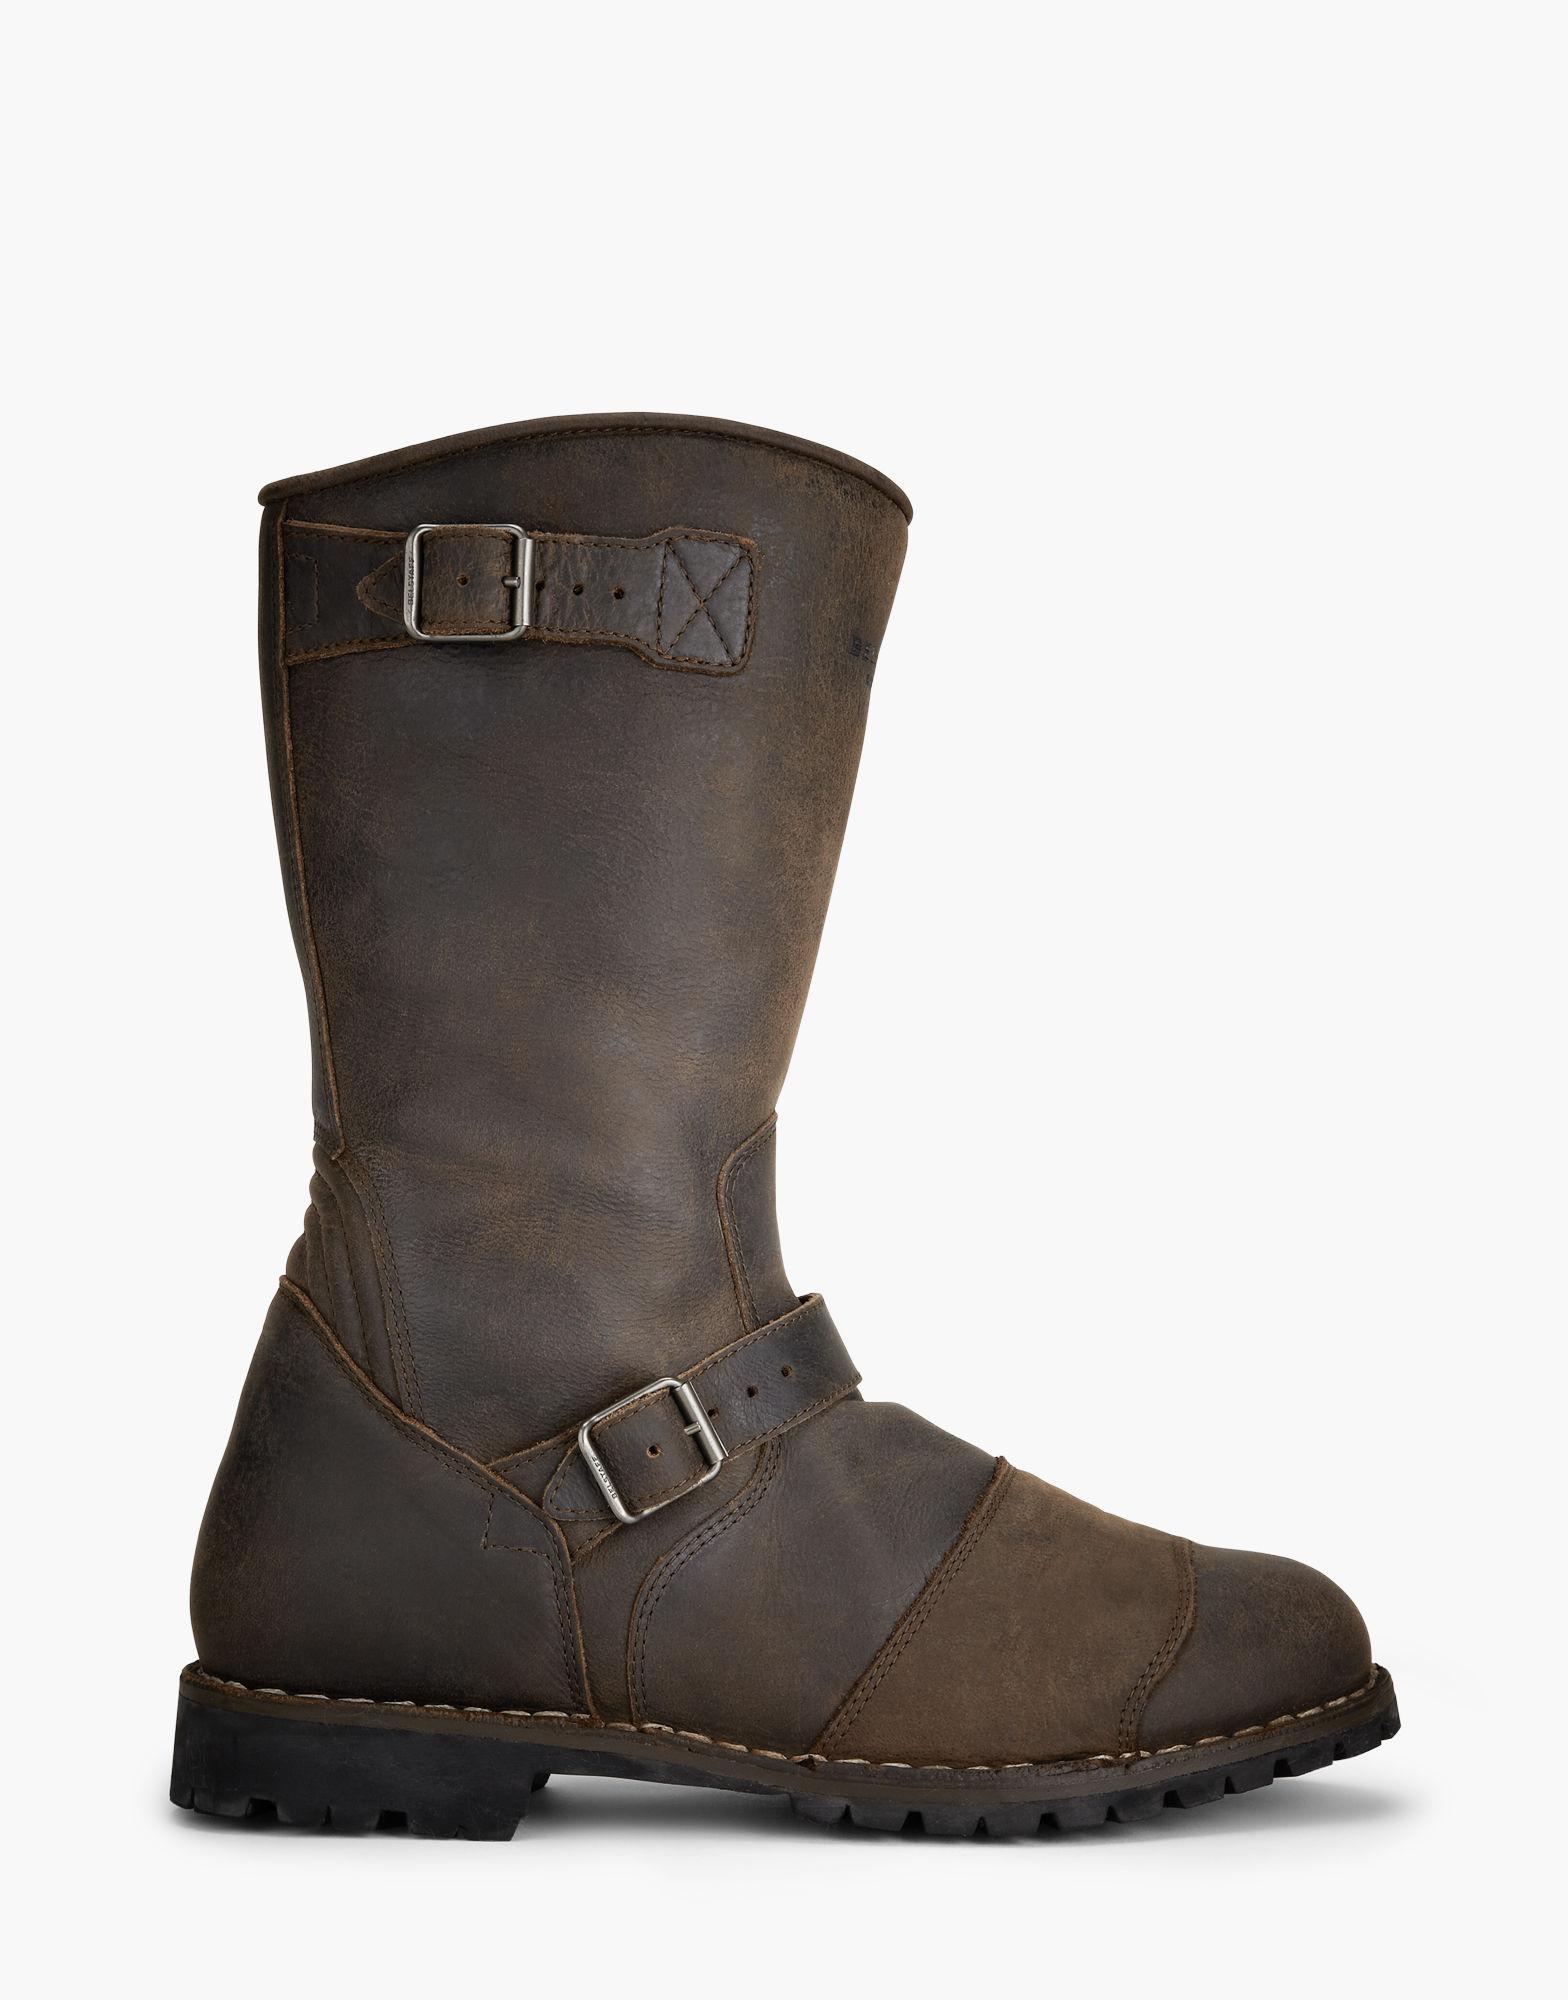 Belstaff Endurance Boot in Black for Men